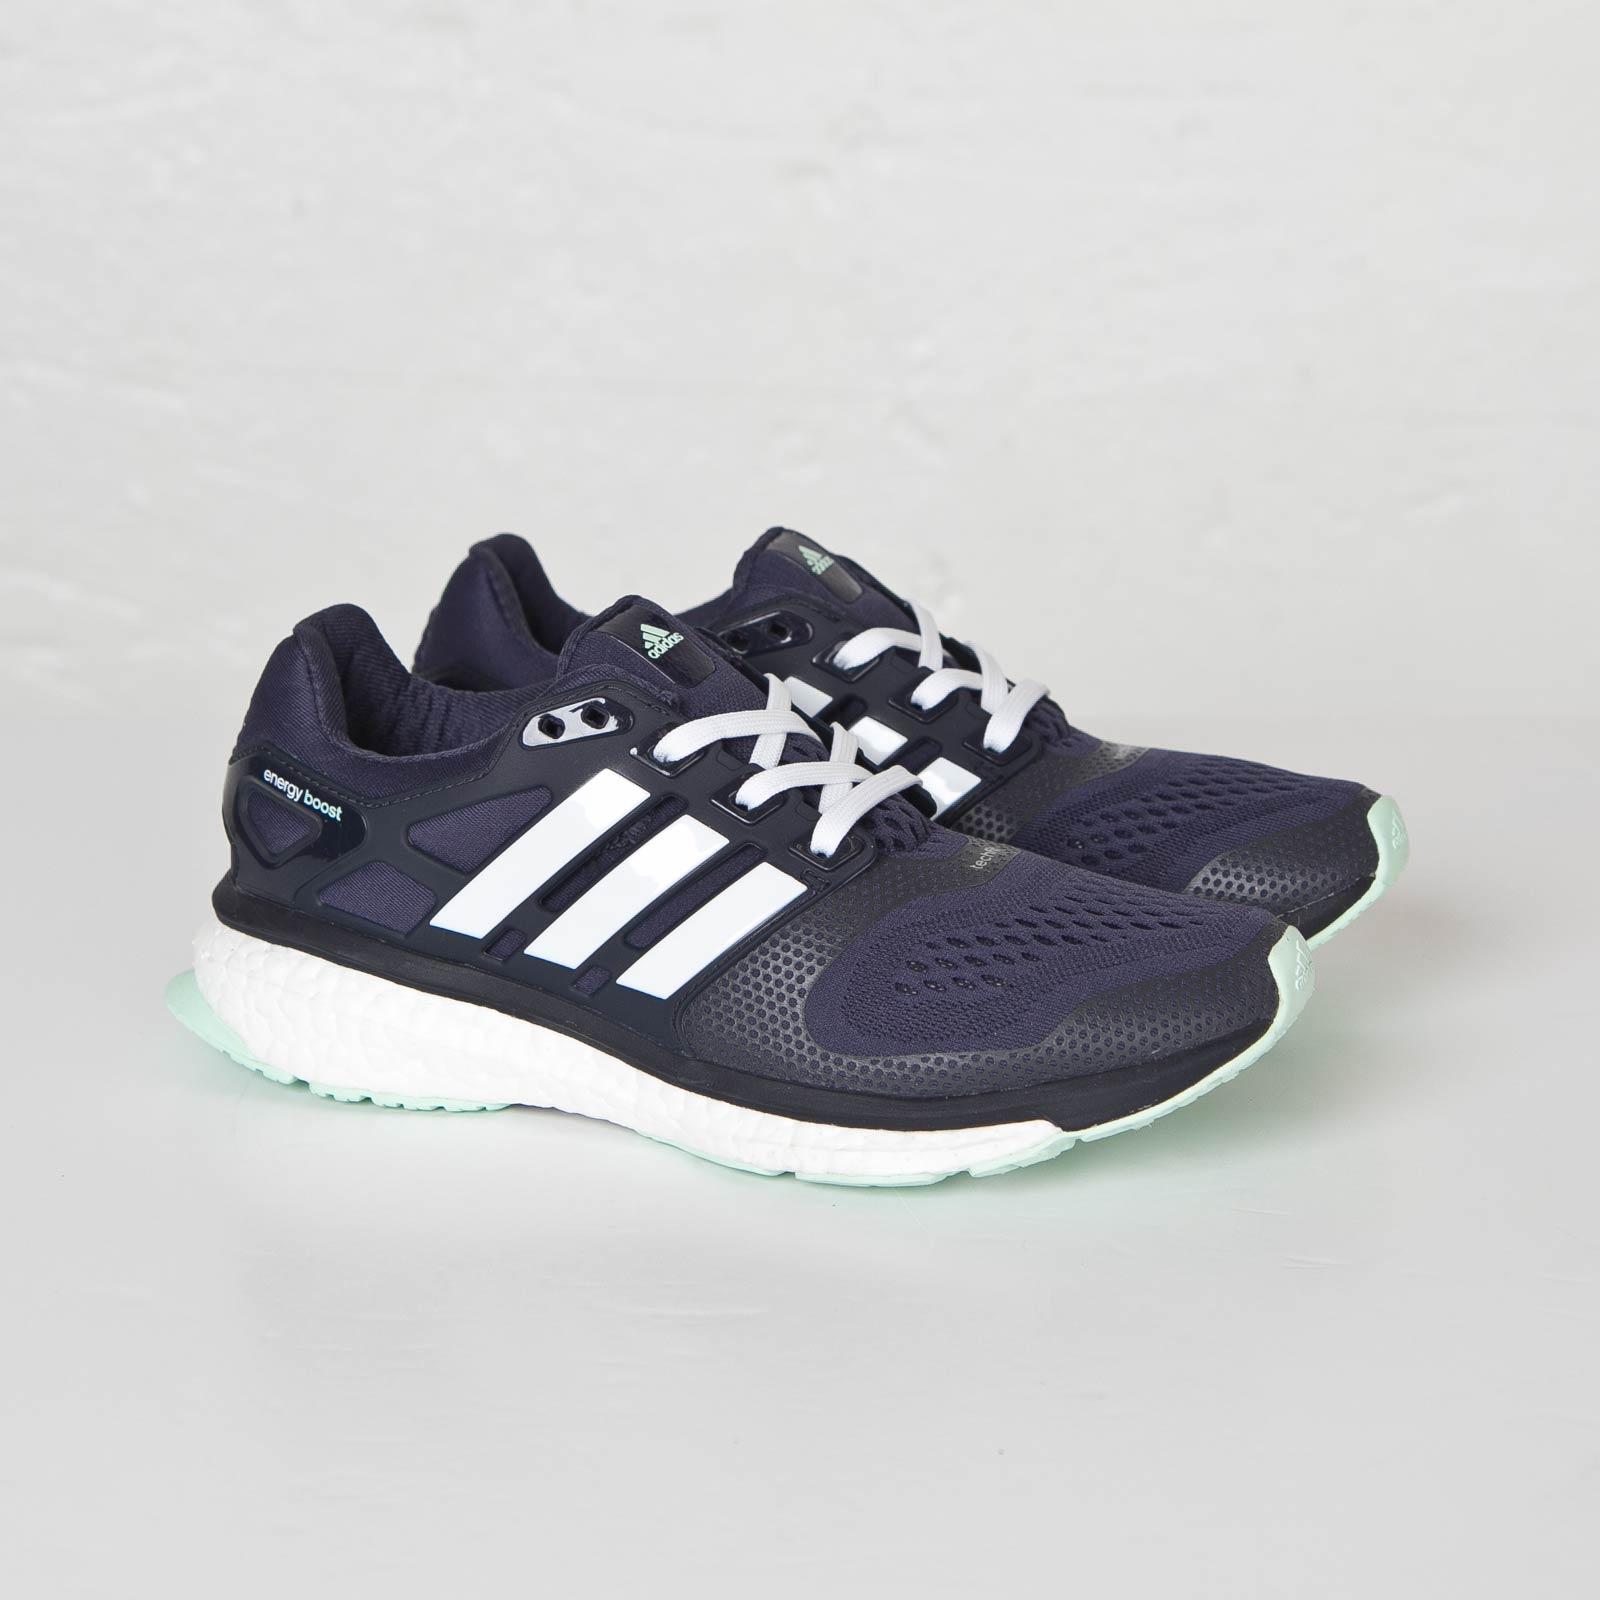 adidas energia impulso esm w s77551 sneakersnstuff scarpe